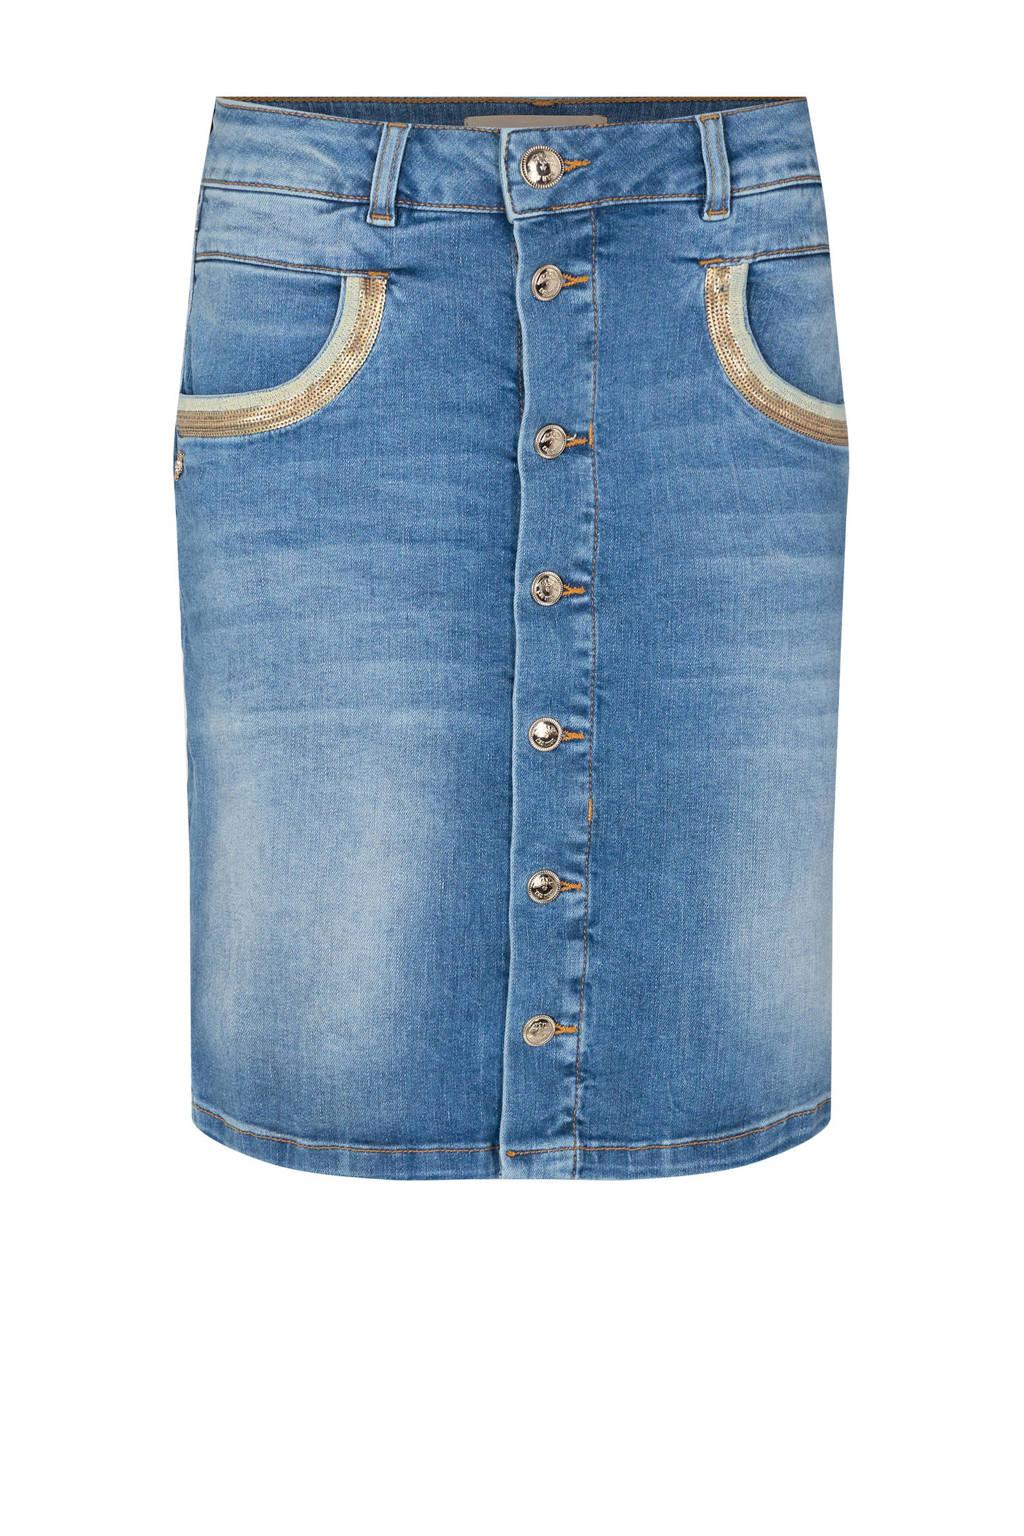 Mos Mosh spijkerrok Vicky Wave Skirt met pailletten, Light blue denim